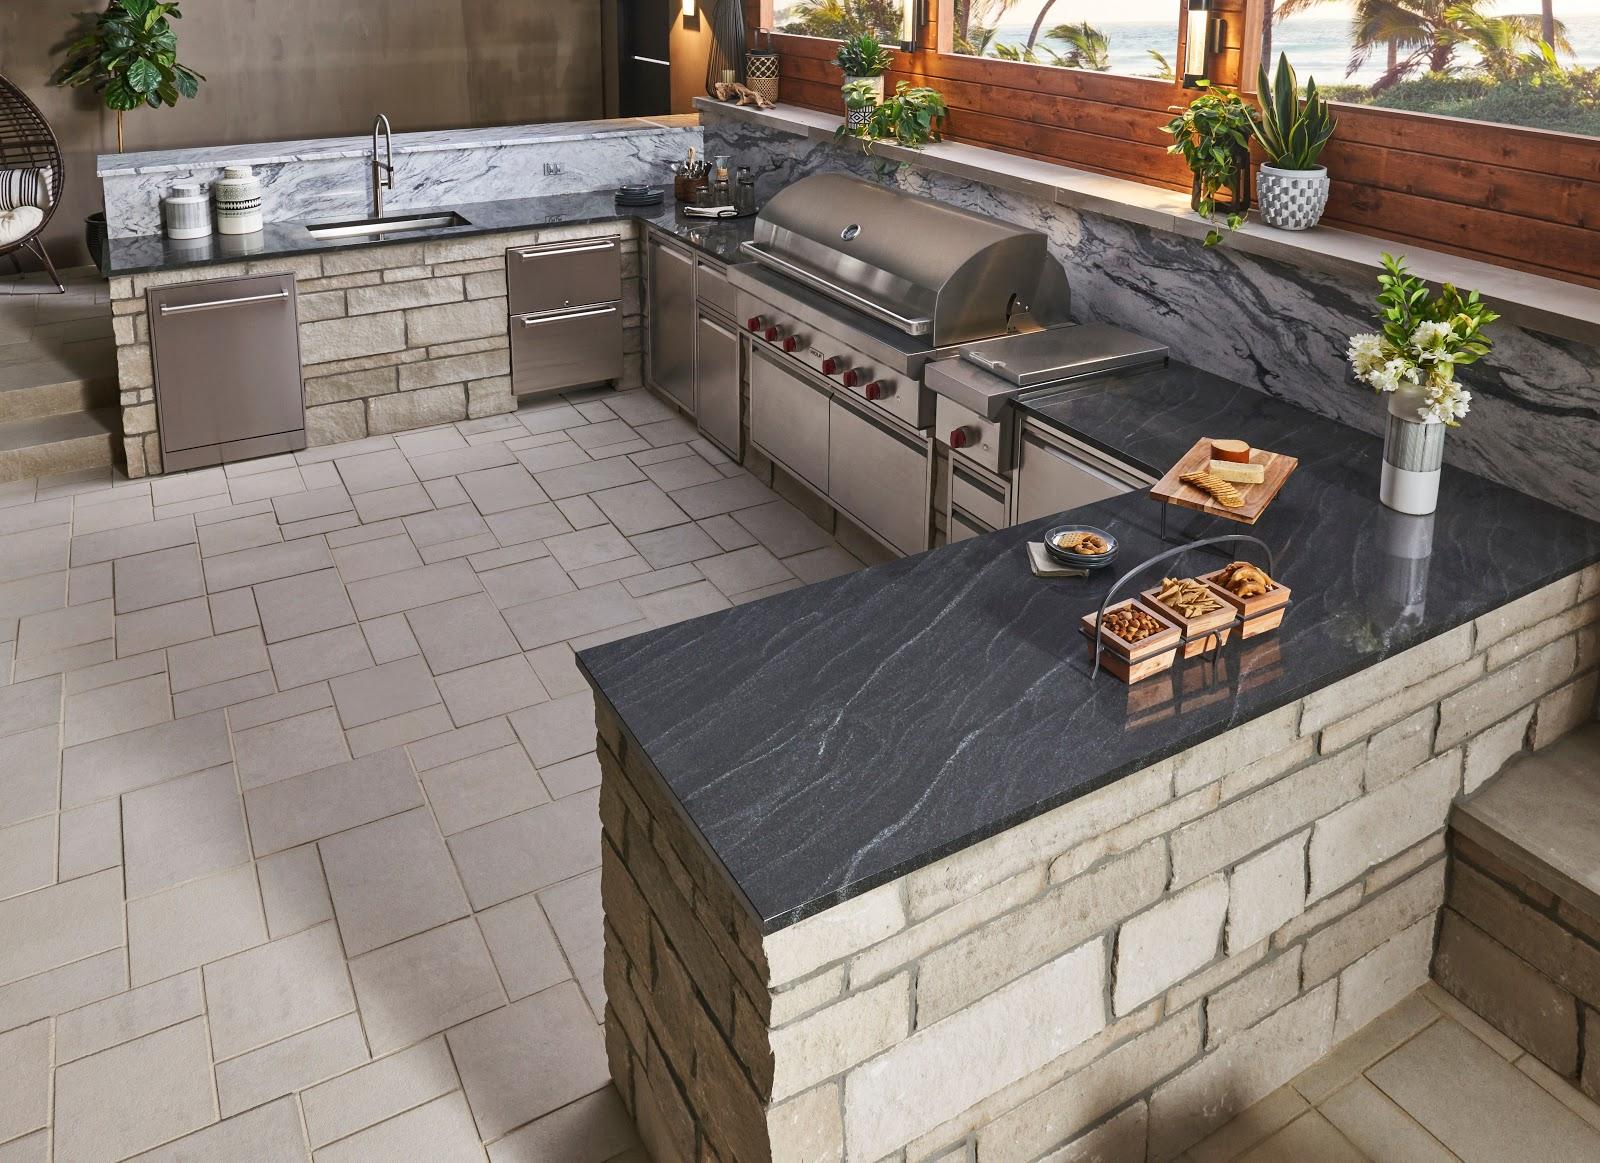 BERKSHIRE™ Indiana limestone thin veneer and Indiana Limestone - Full Color Blend pavers